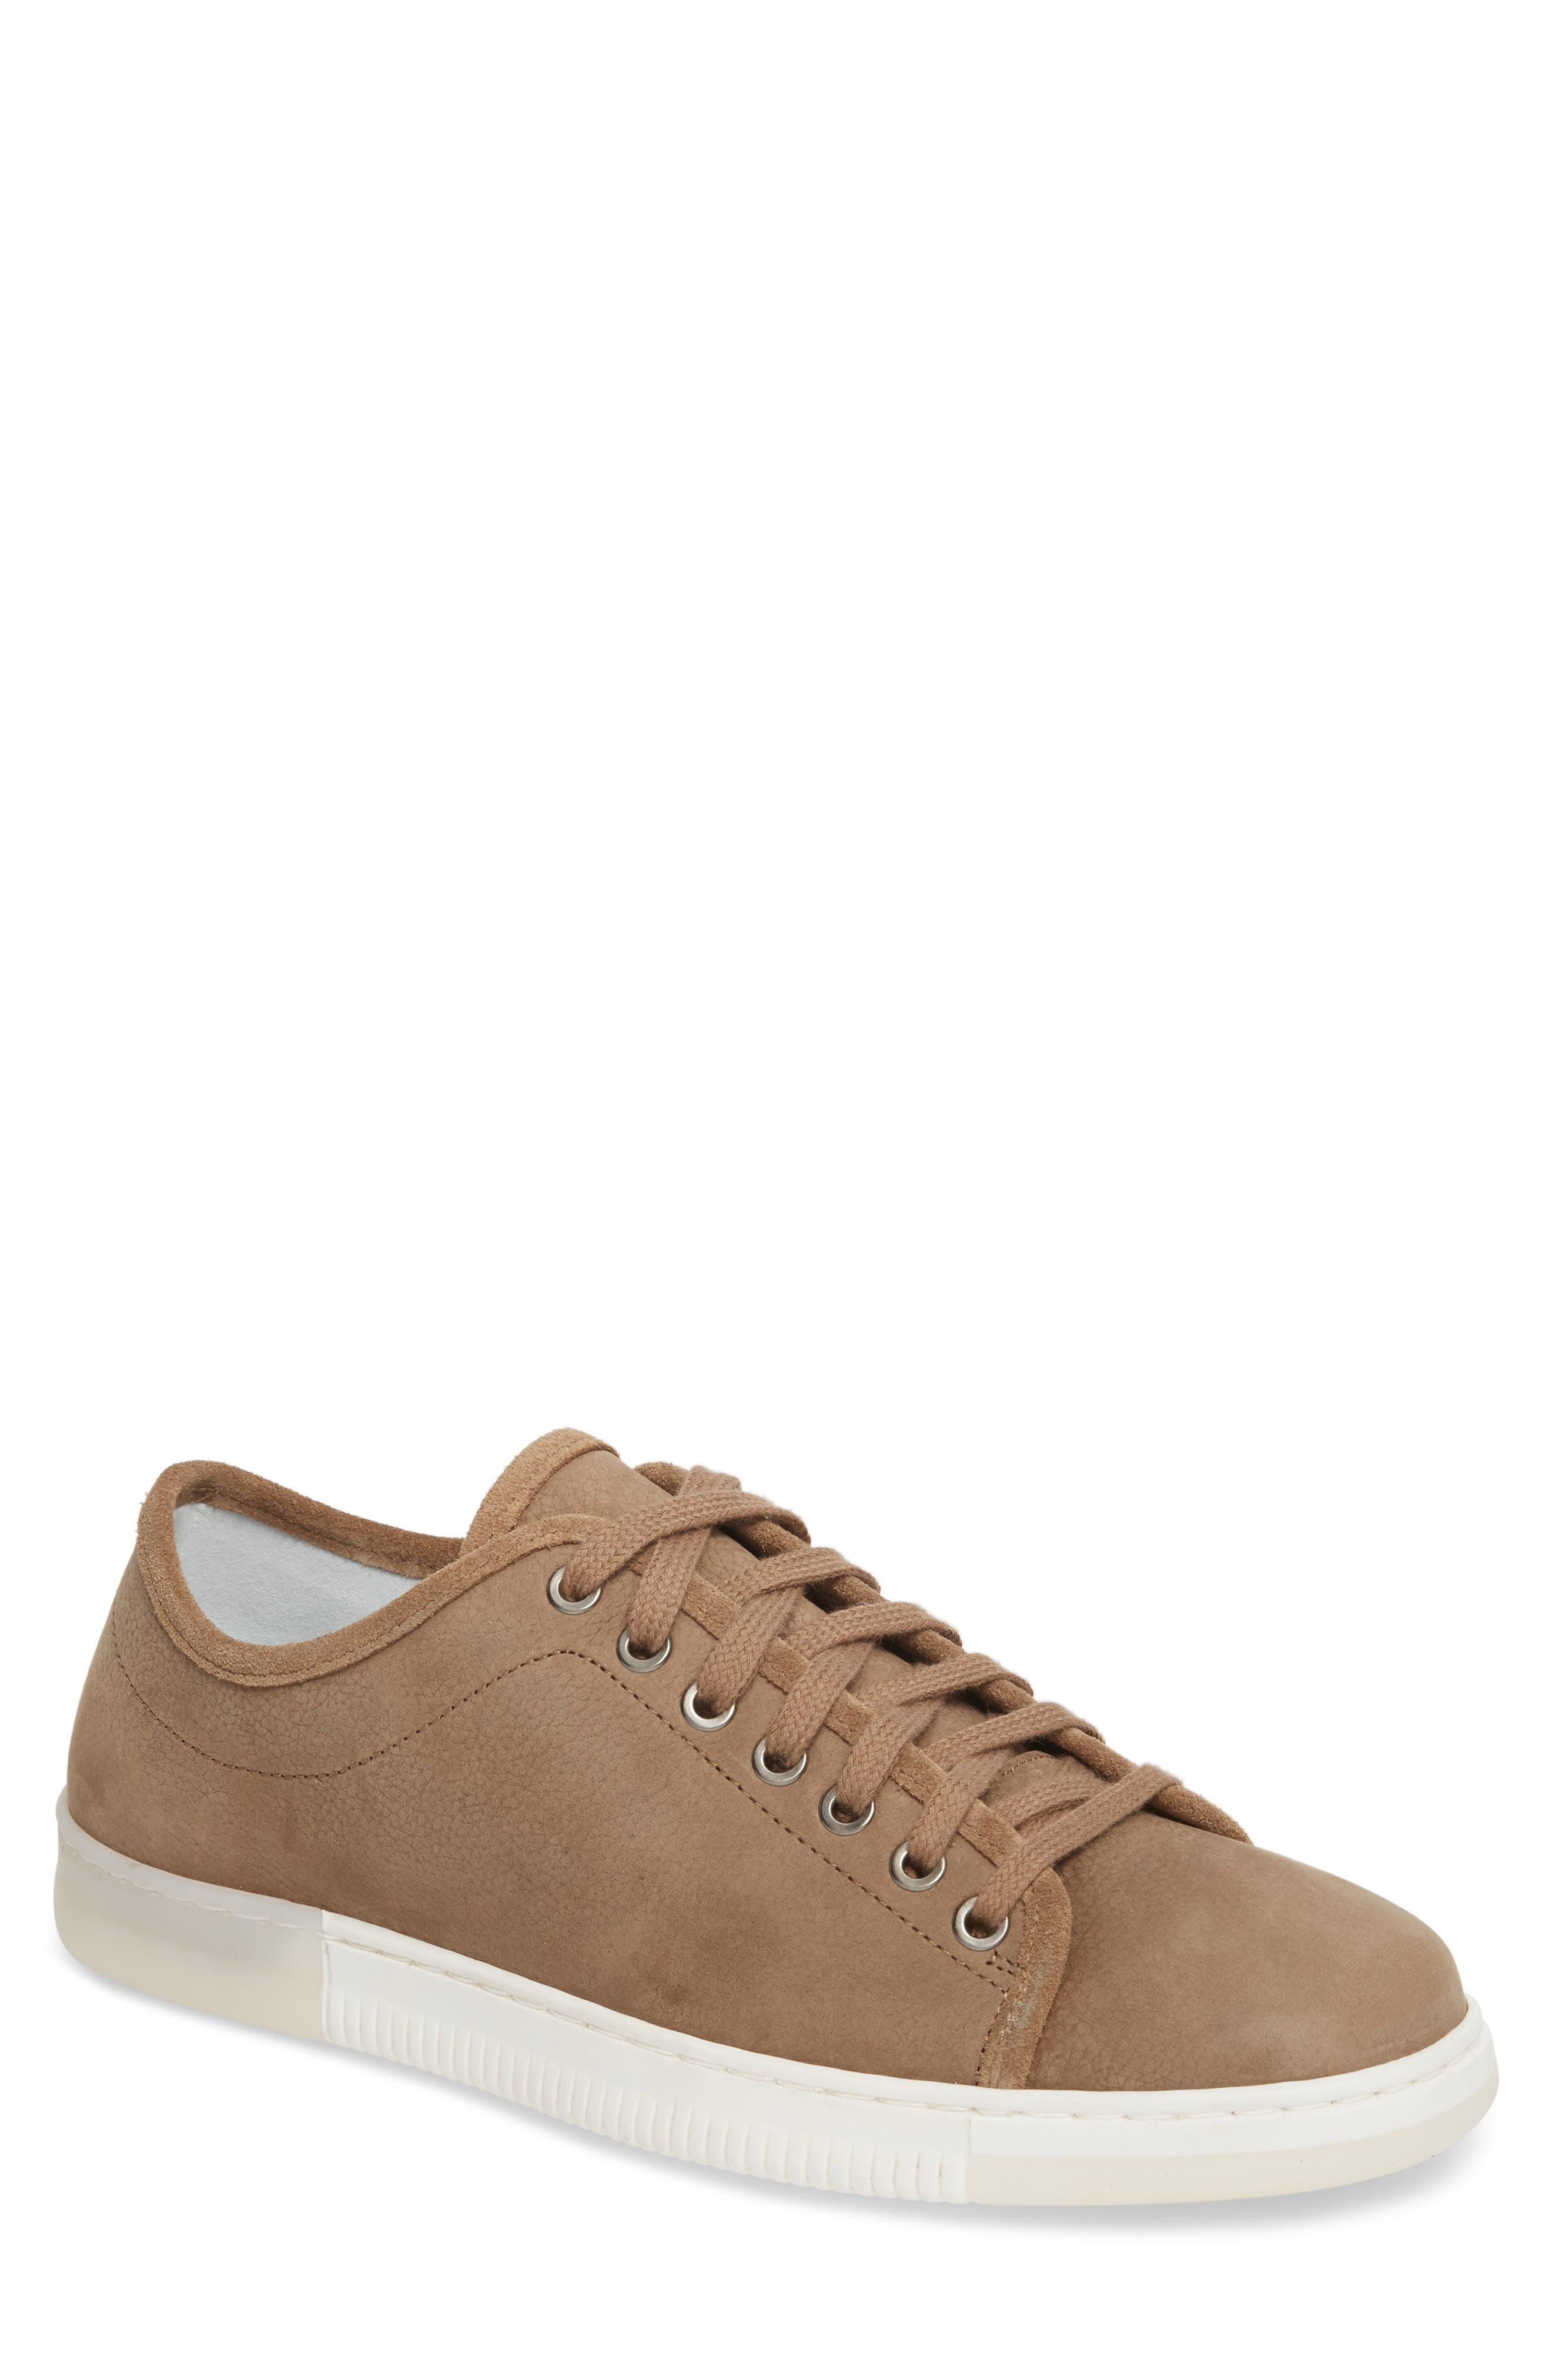 'Justen' Sneaker,                         Main,                         color, 251